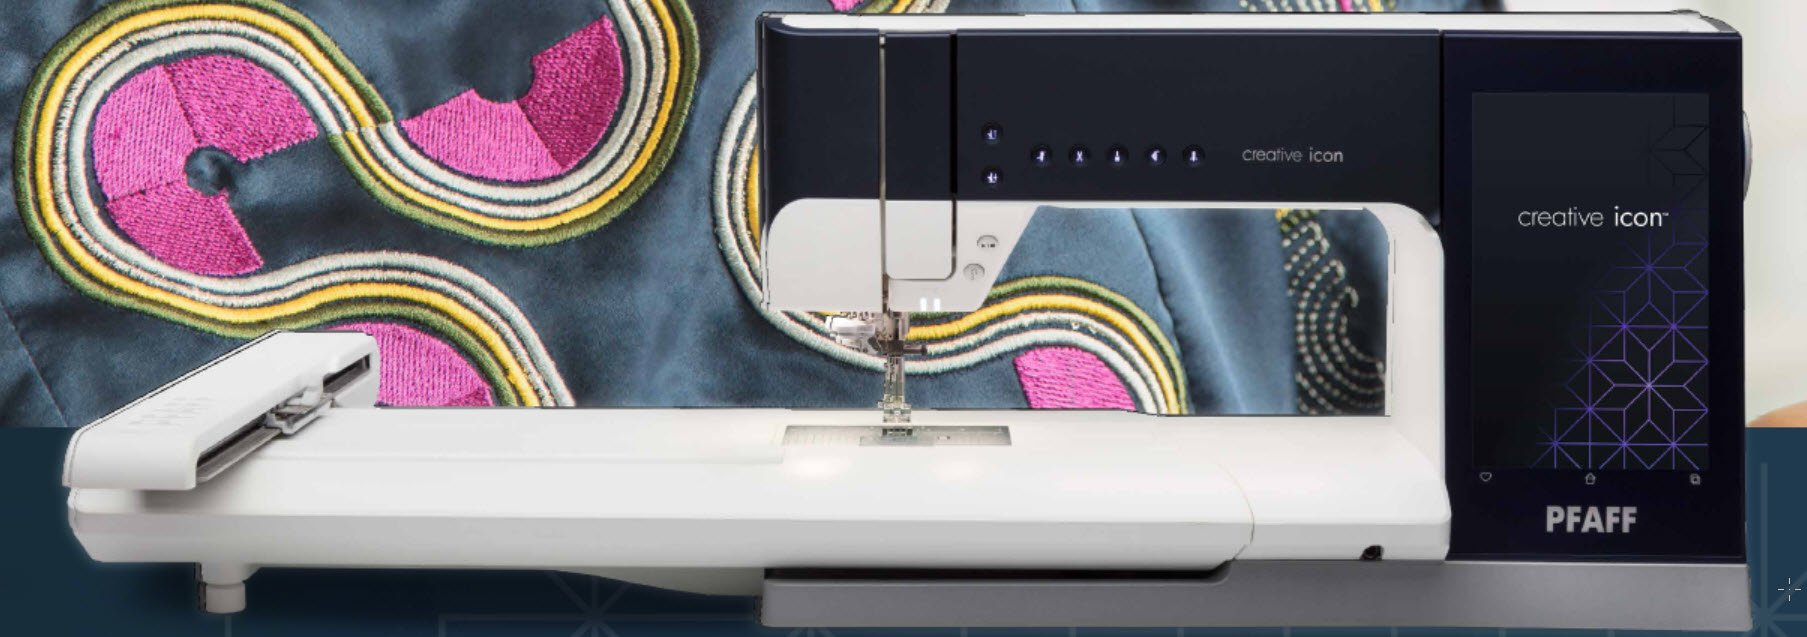 pfaff sewing machine dealer